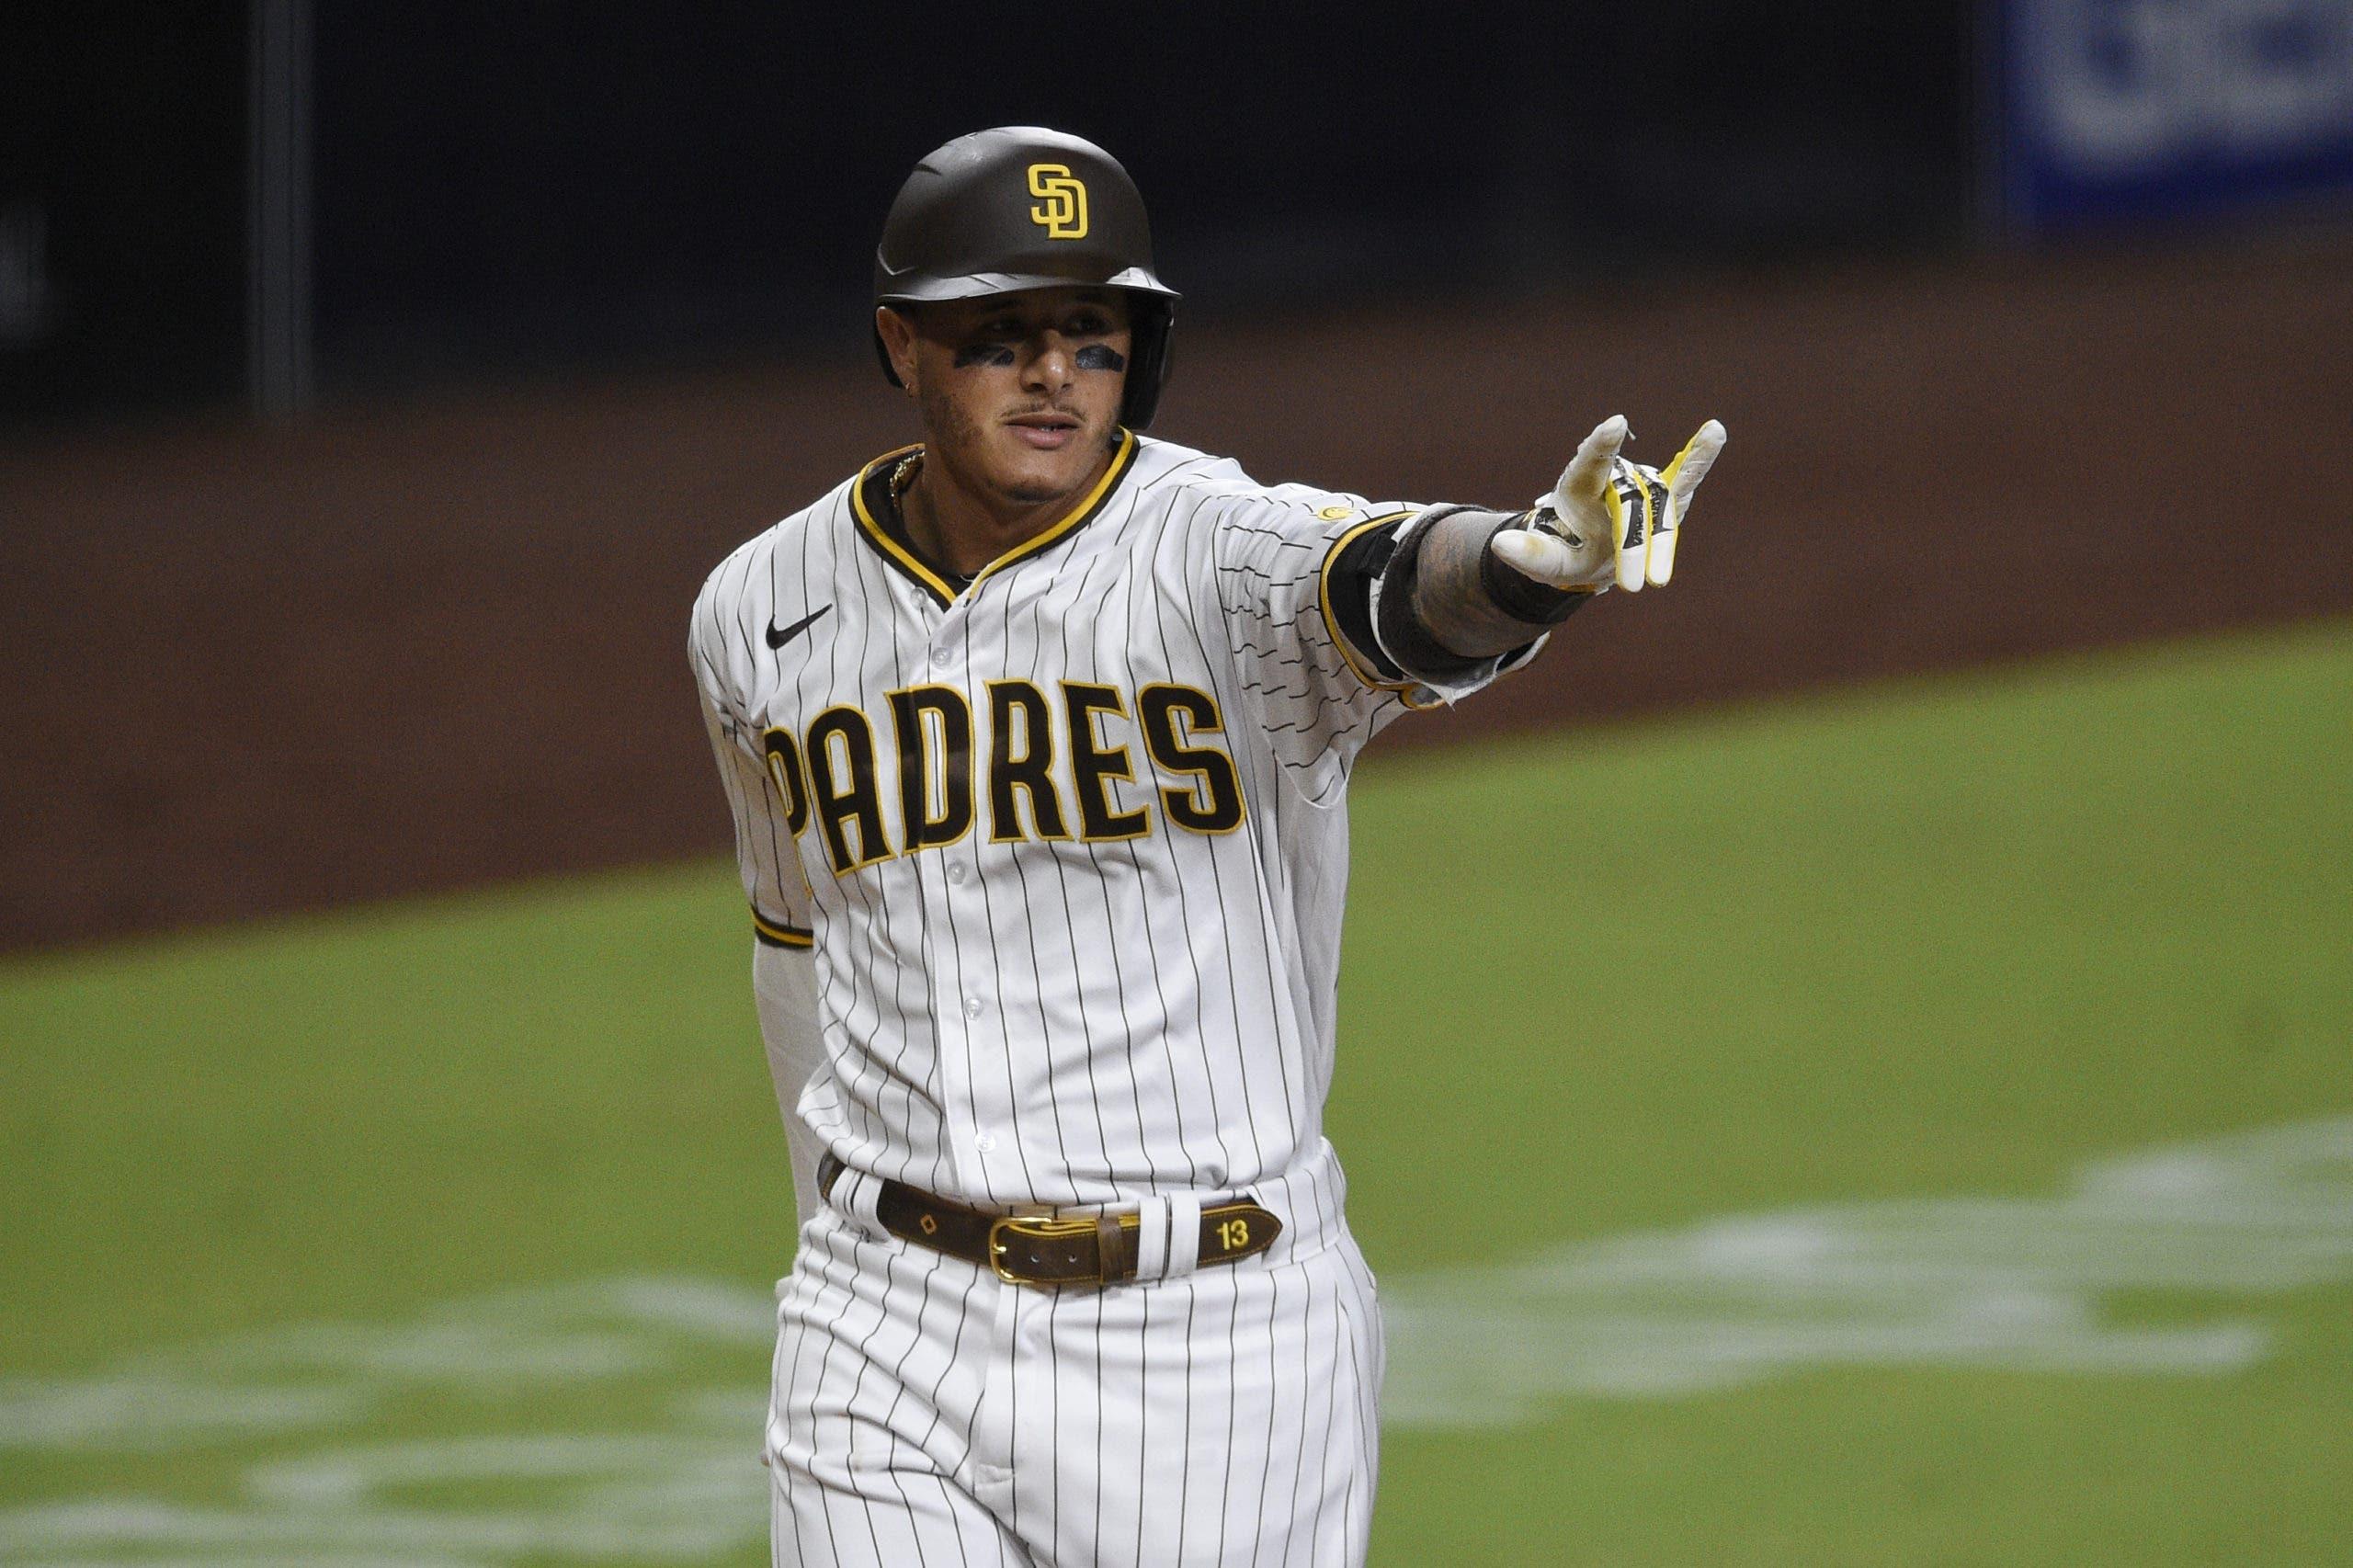 Manny Machado sacude 1er HR y Padres ganan